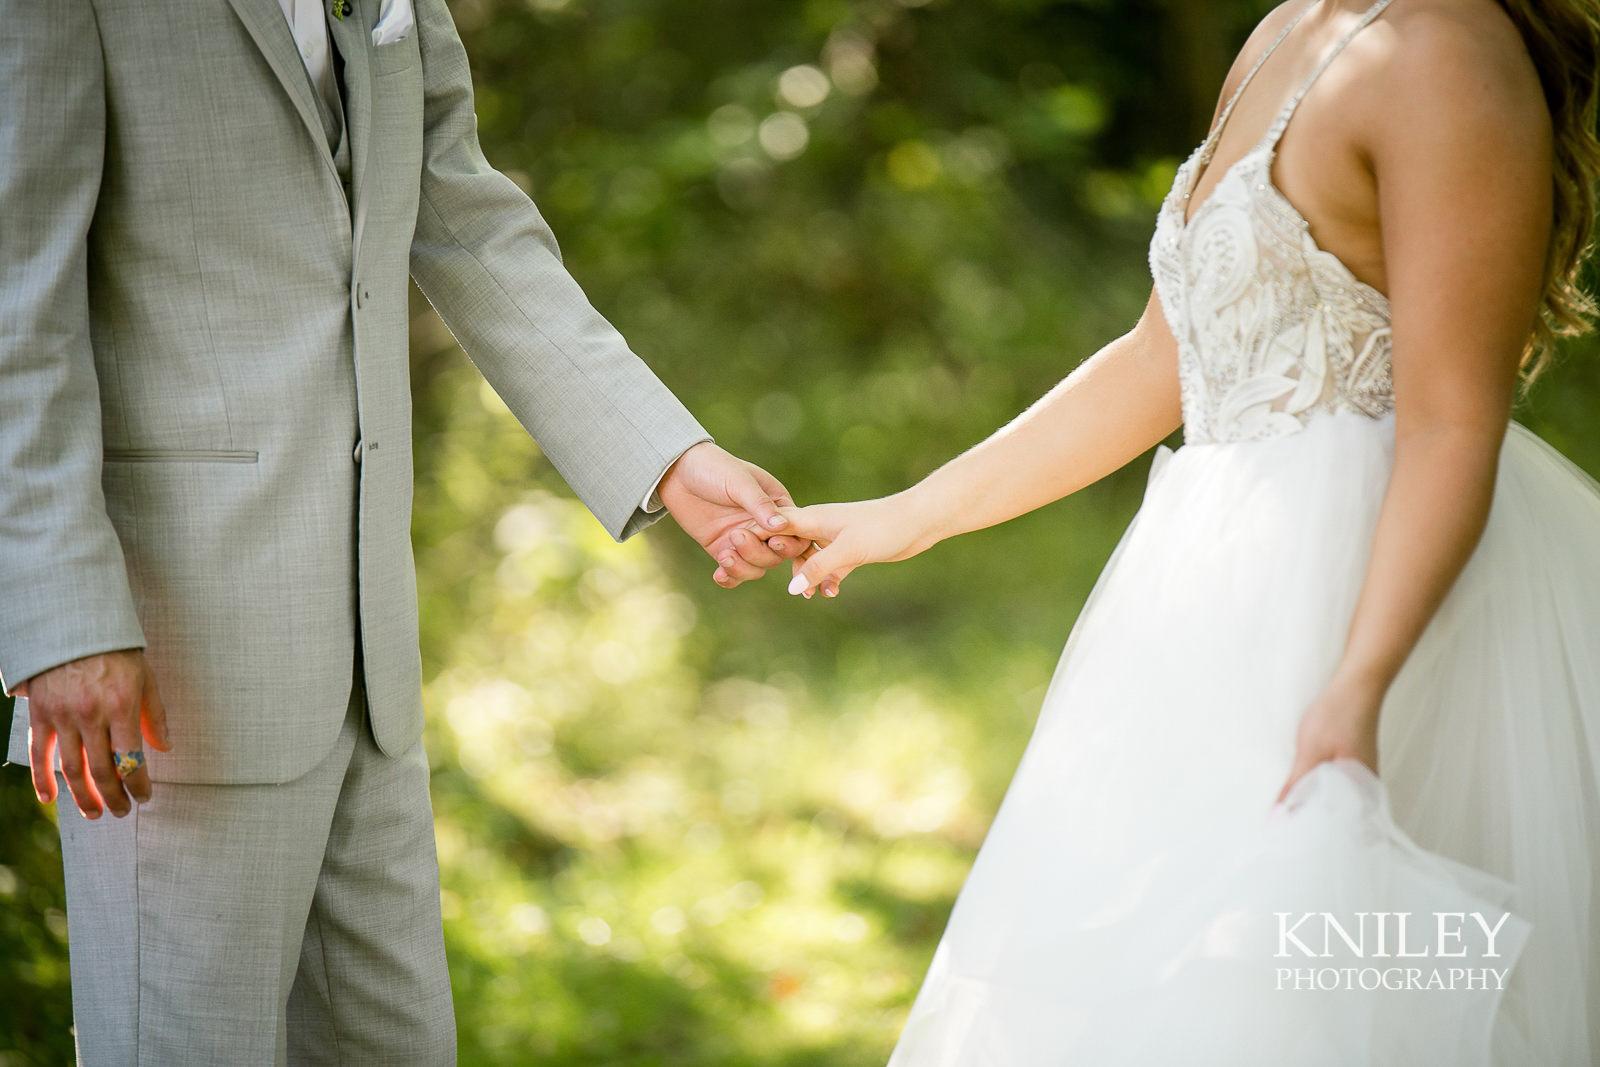 077 - Buffalo NY wedding pictures - IMG_8274.jpg